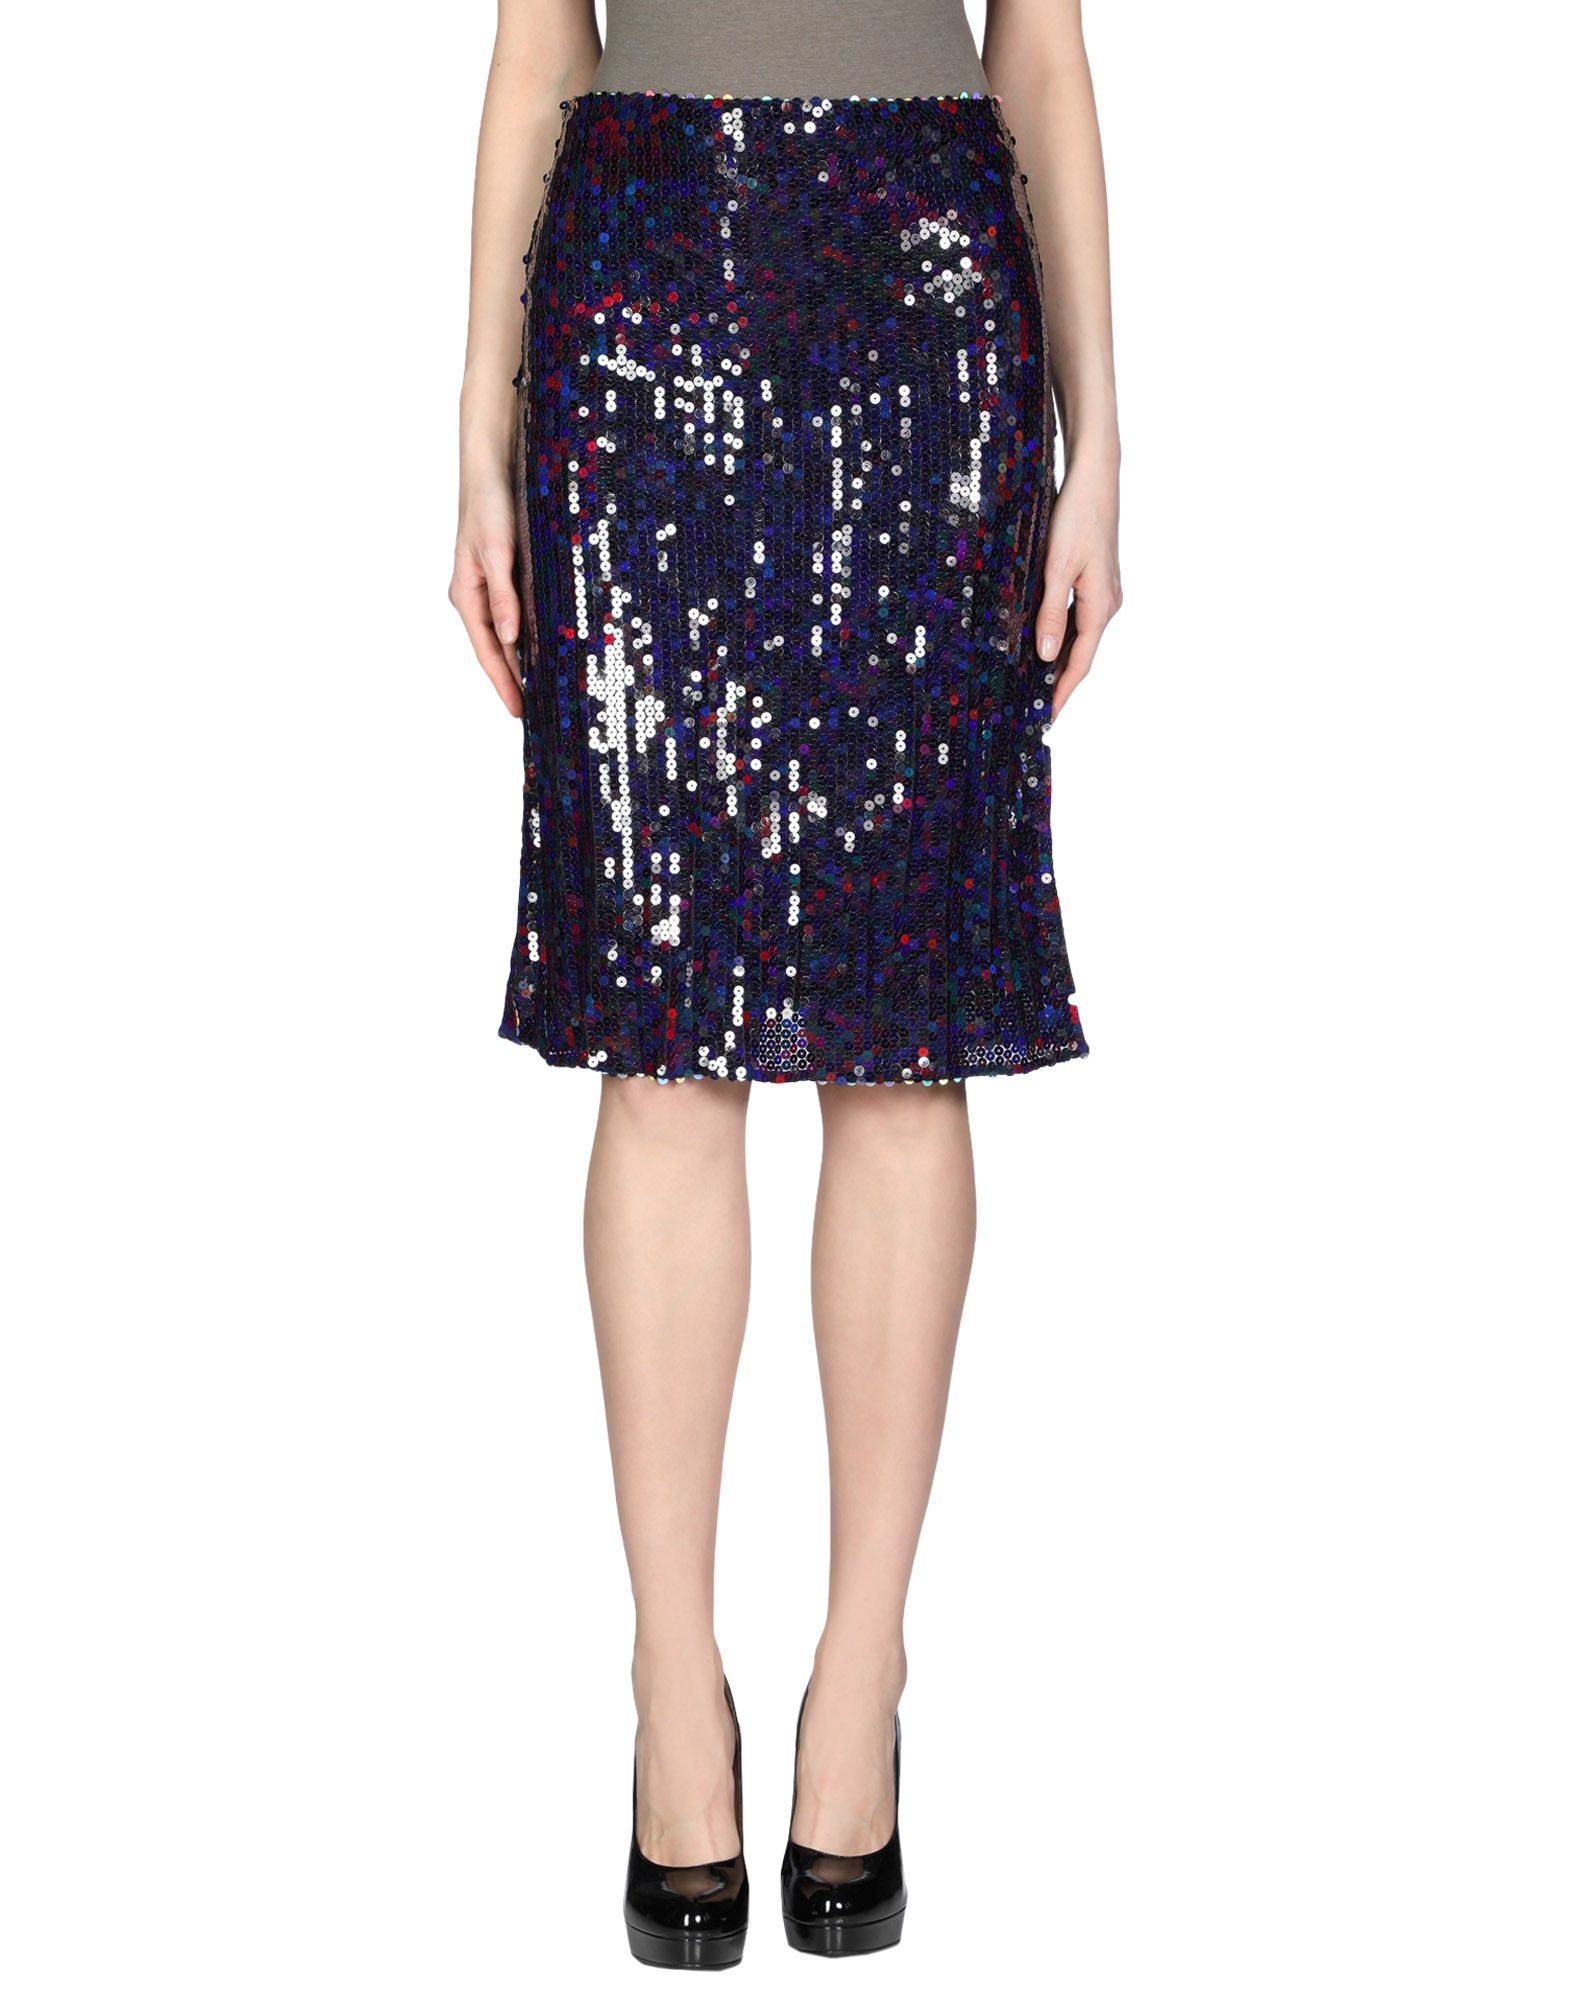 6f86418431f Sequin Mid Length Skirts - Data Dynamic AG